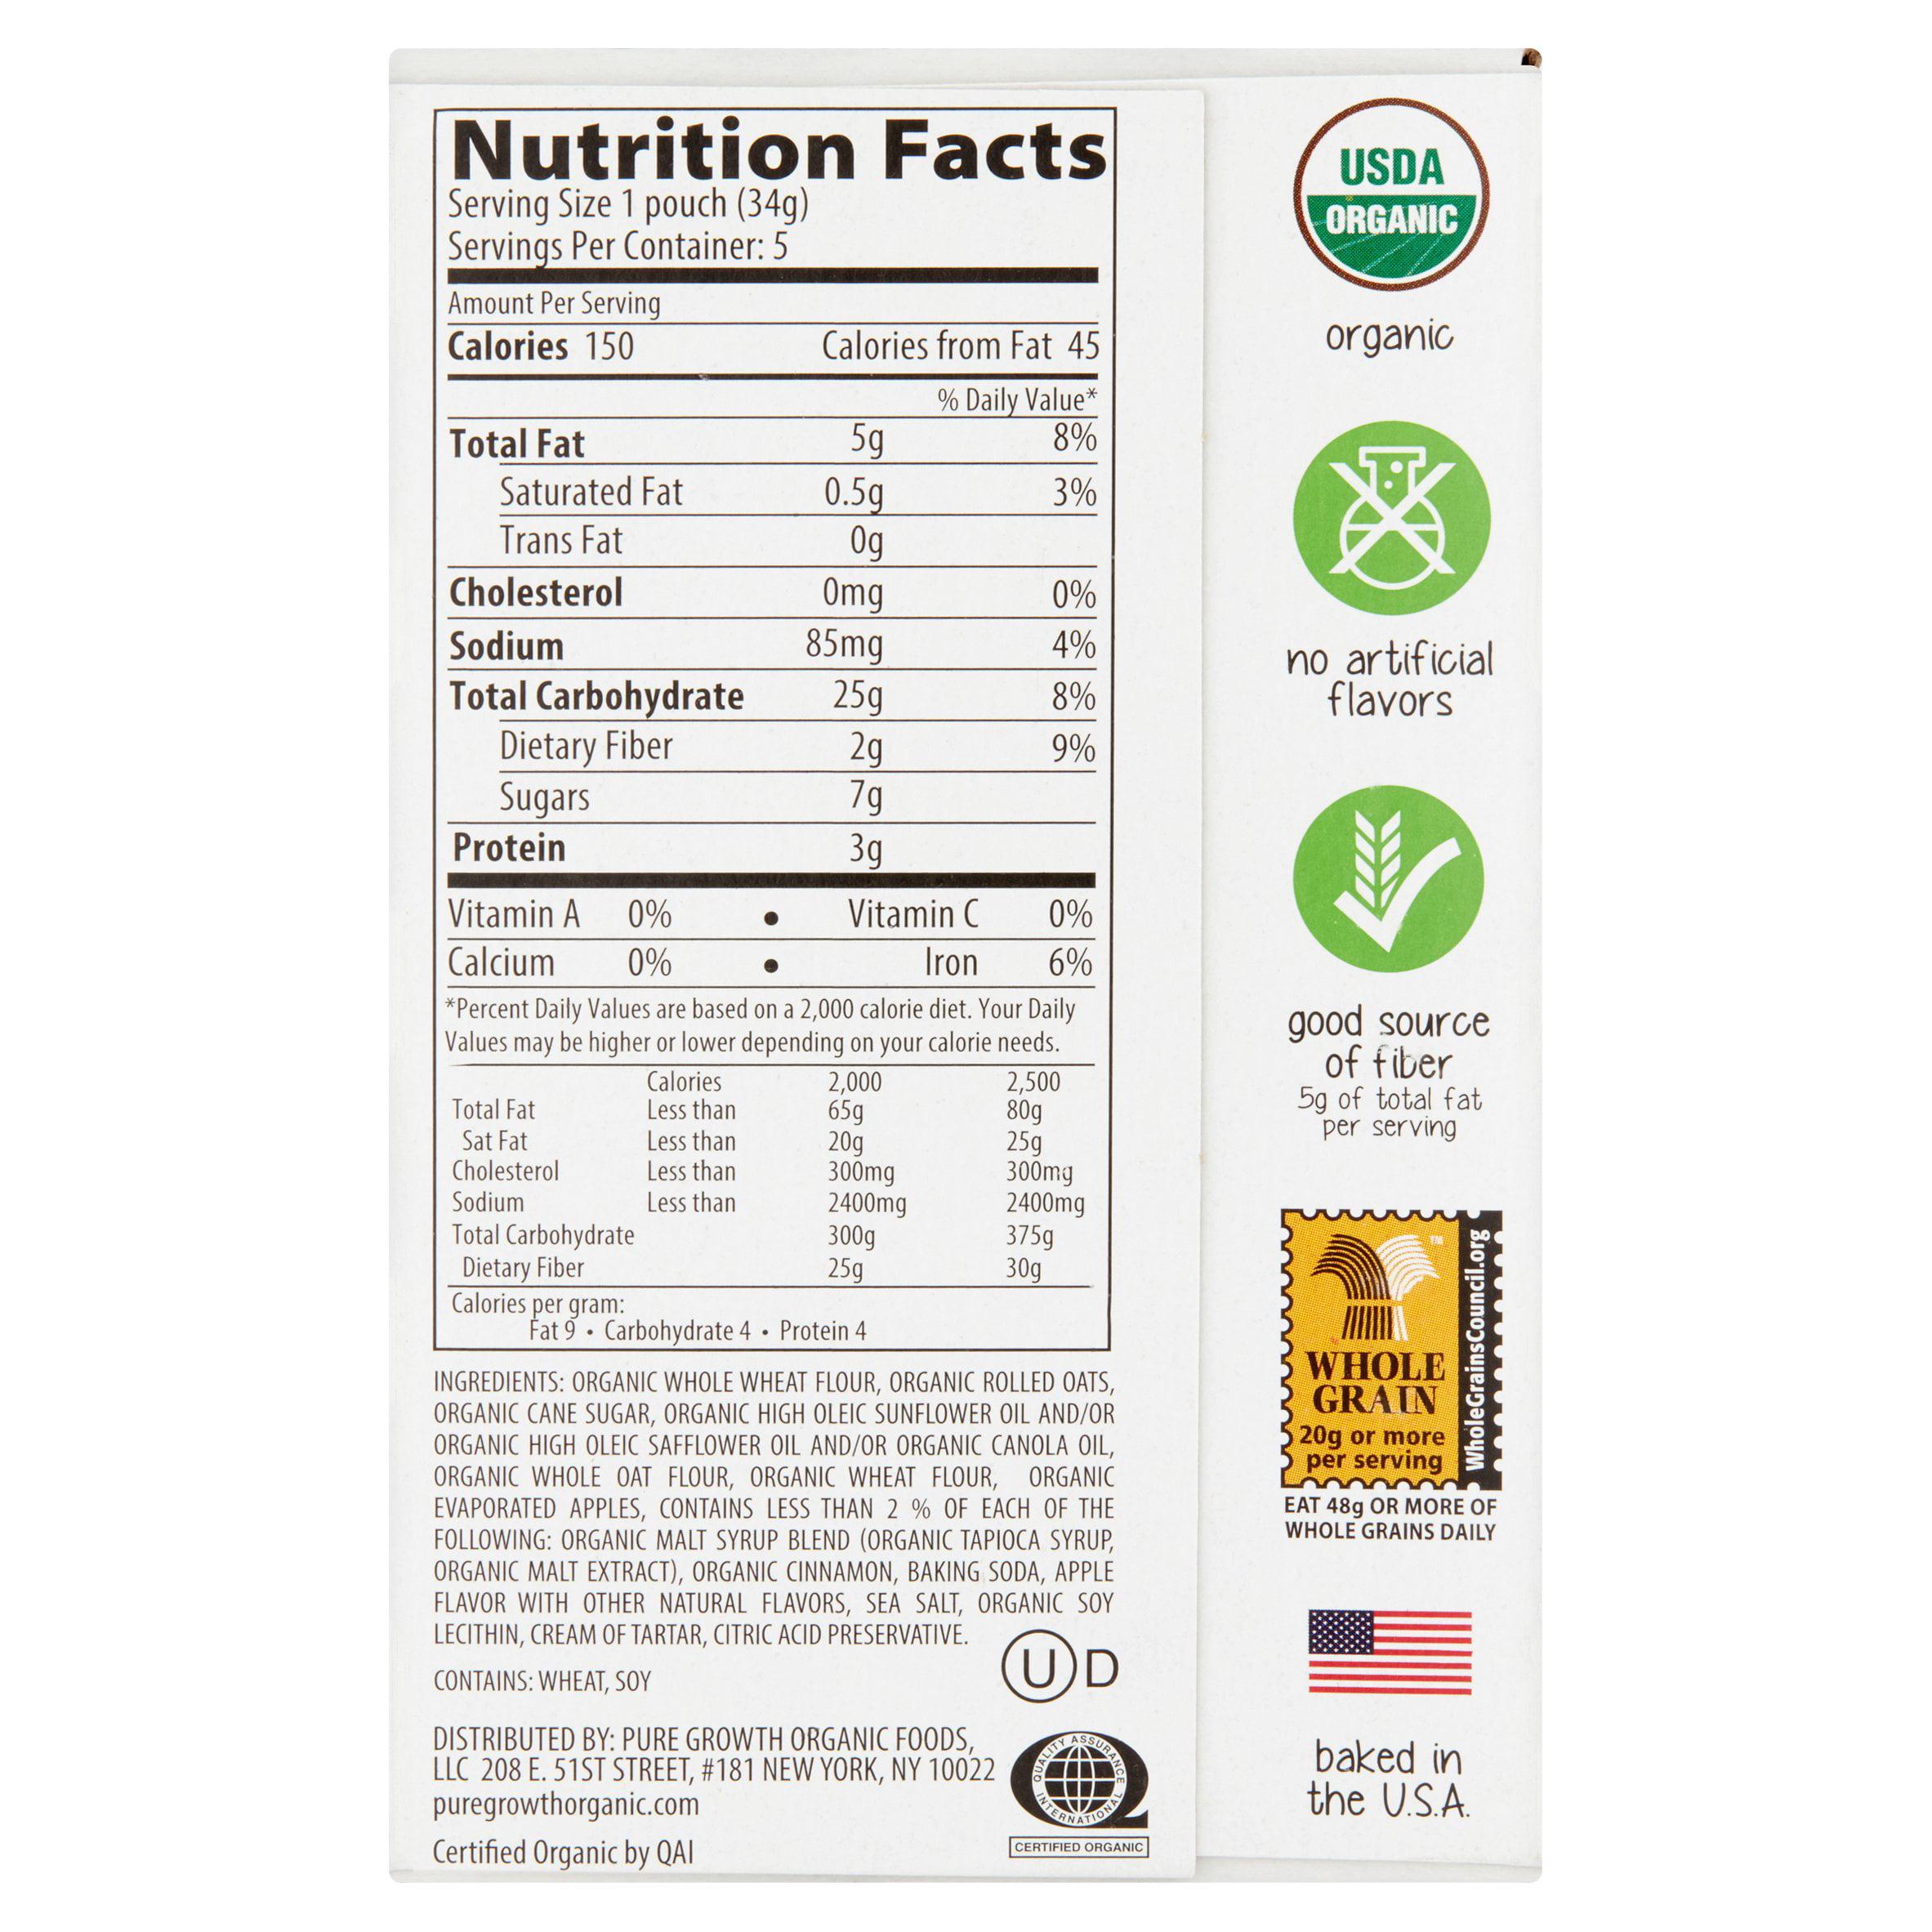 Pure growth organic foods llc